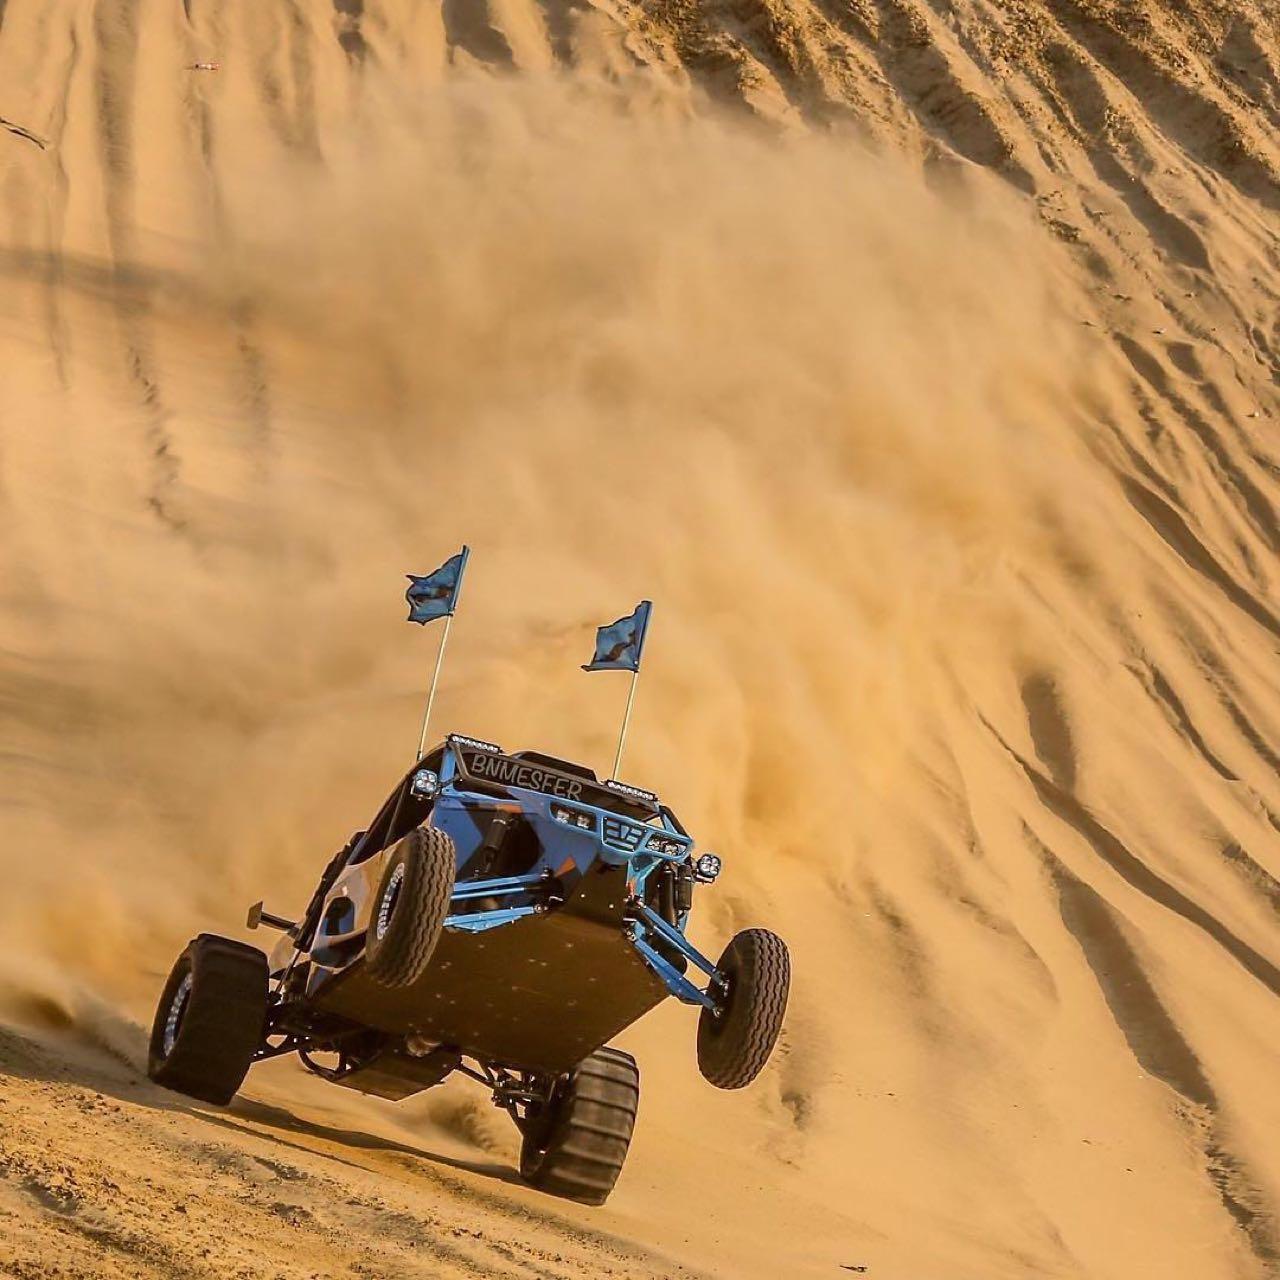 Baja Bug Sandrail : Les monstres du désert ! 2